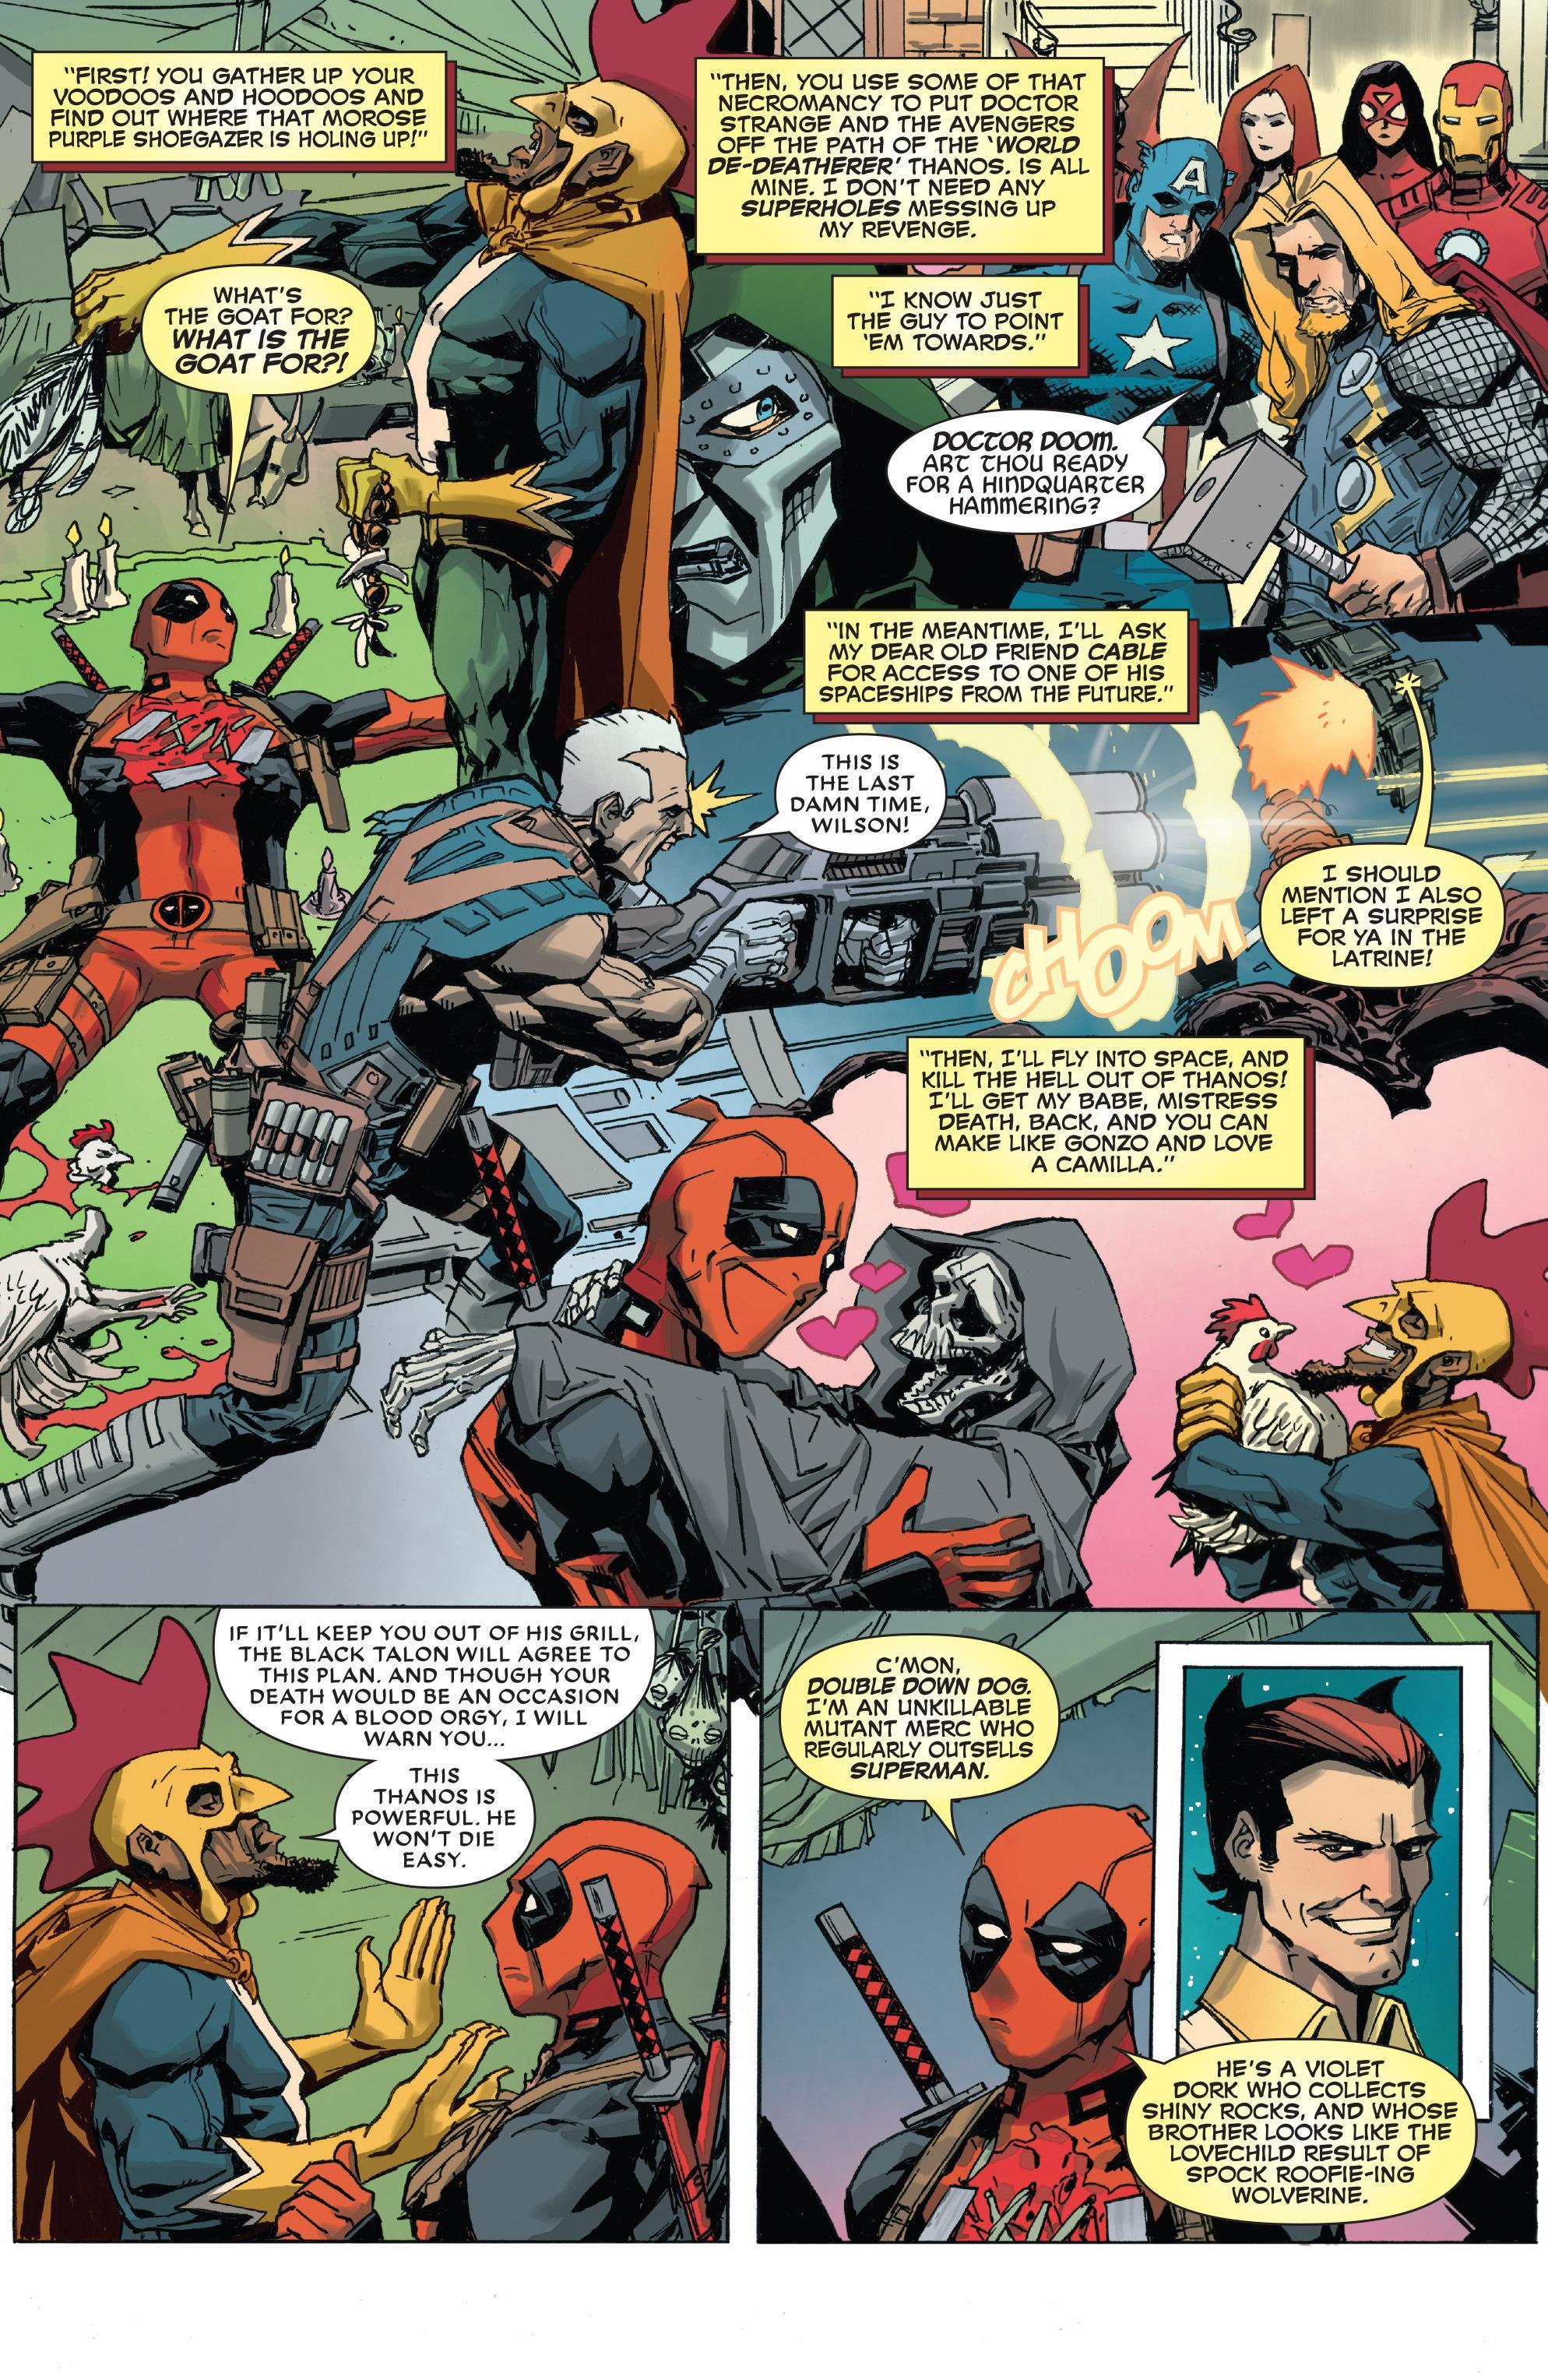 Deadpool vs. Thanos review